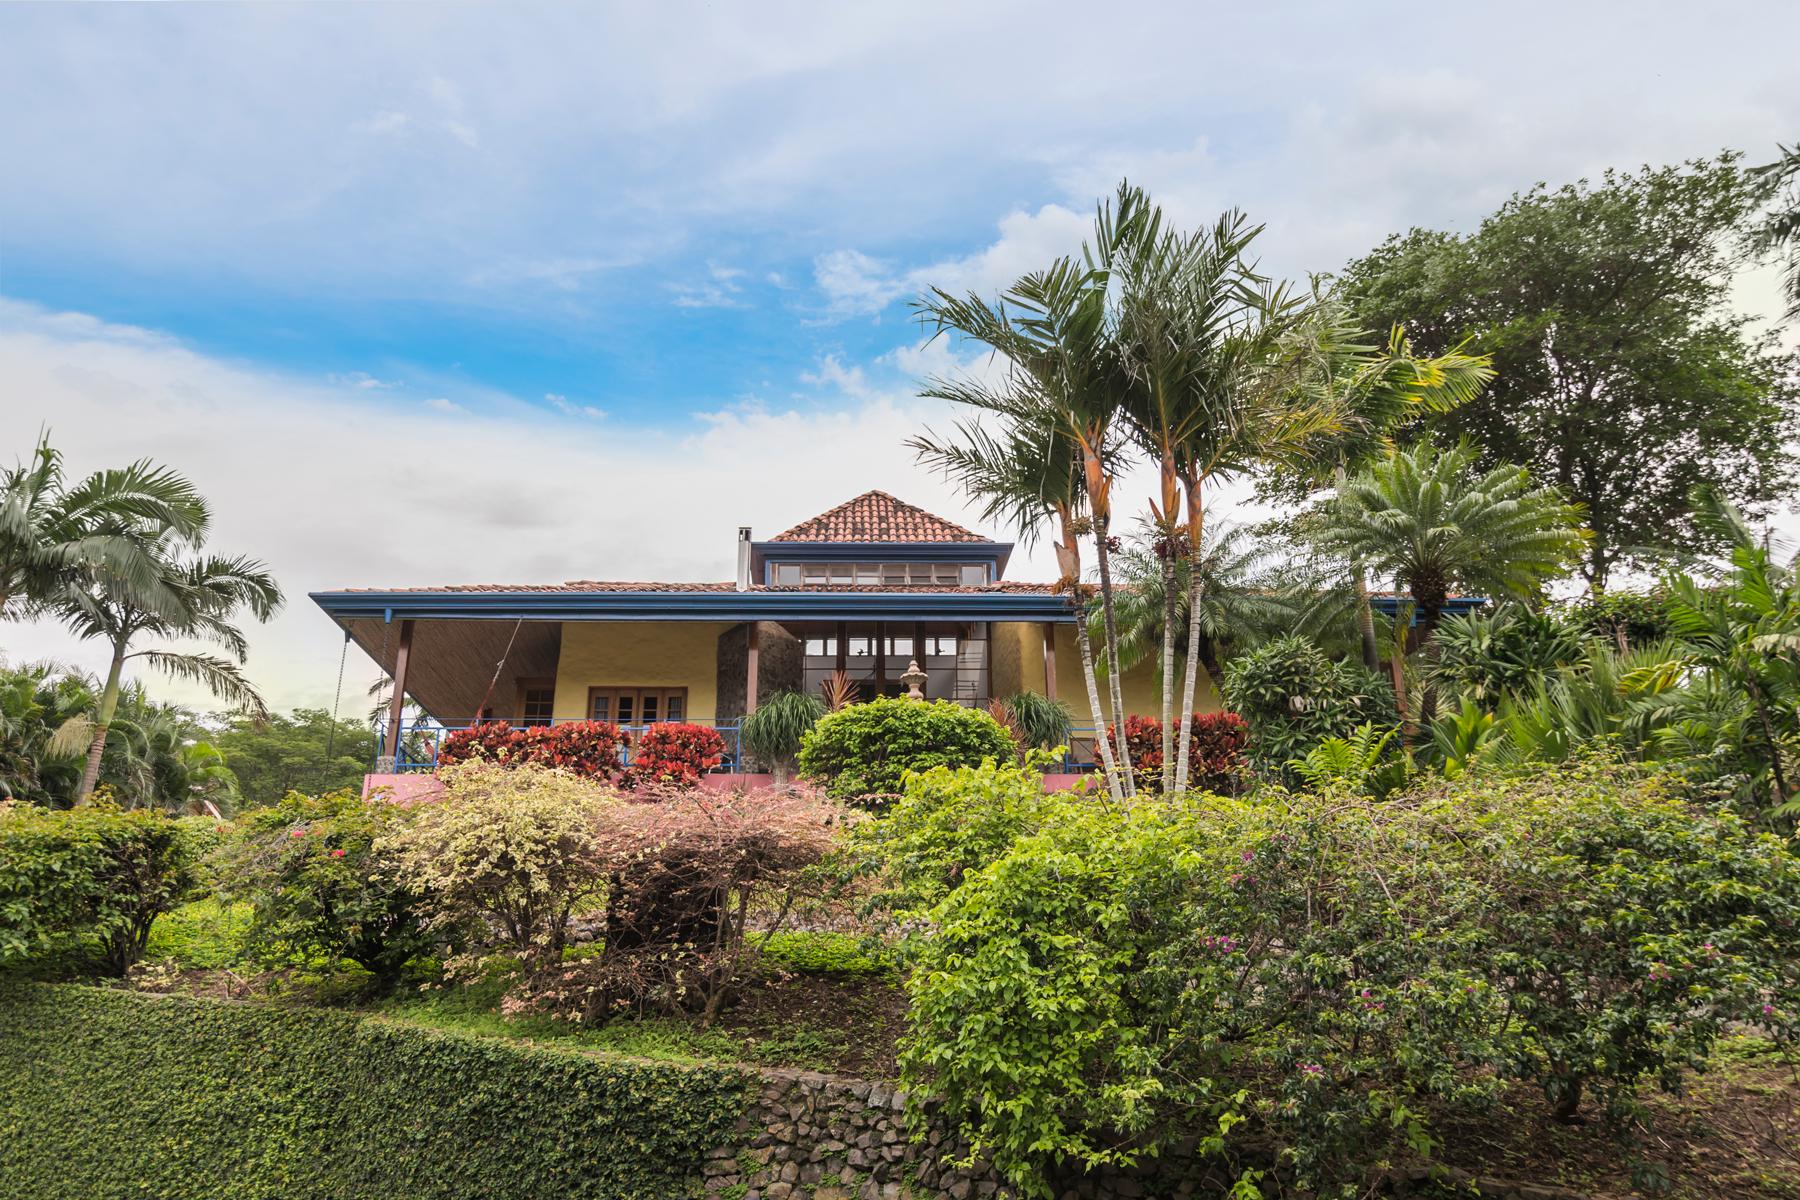 Condominium for Sale at Lush Garden Sunset View Santa Ana, Costa Rica